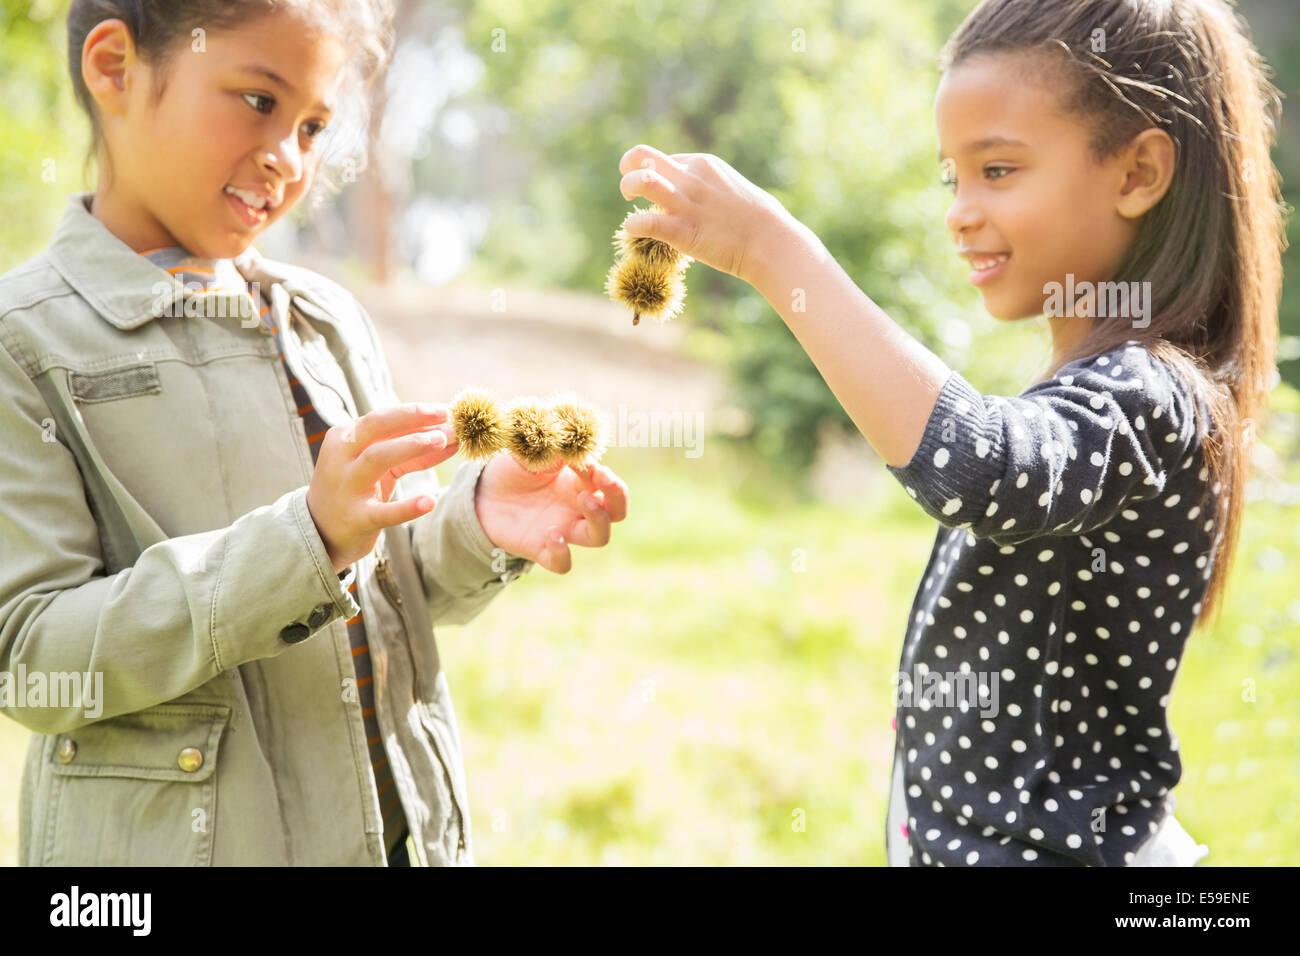 Children examining plants outdoors - Stock Image